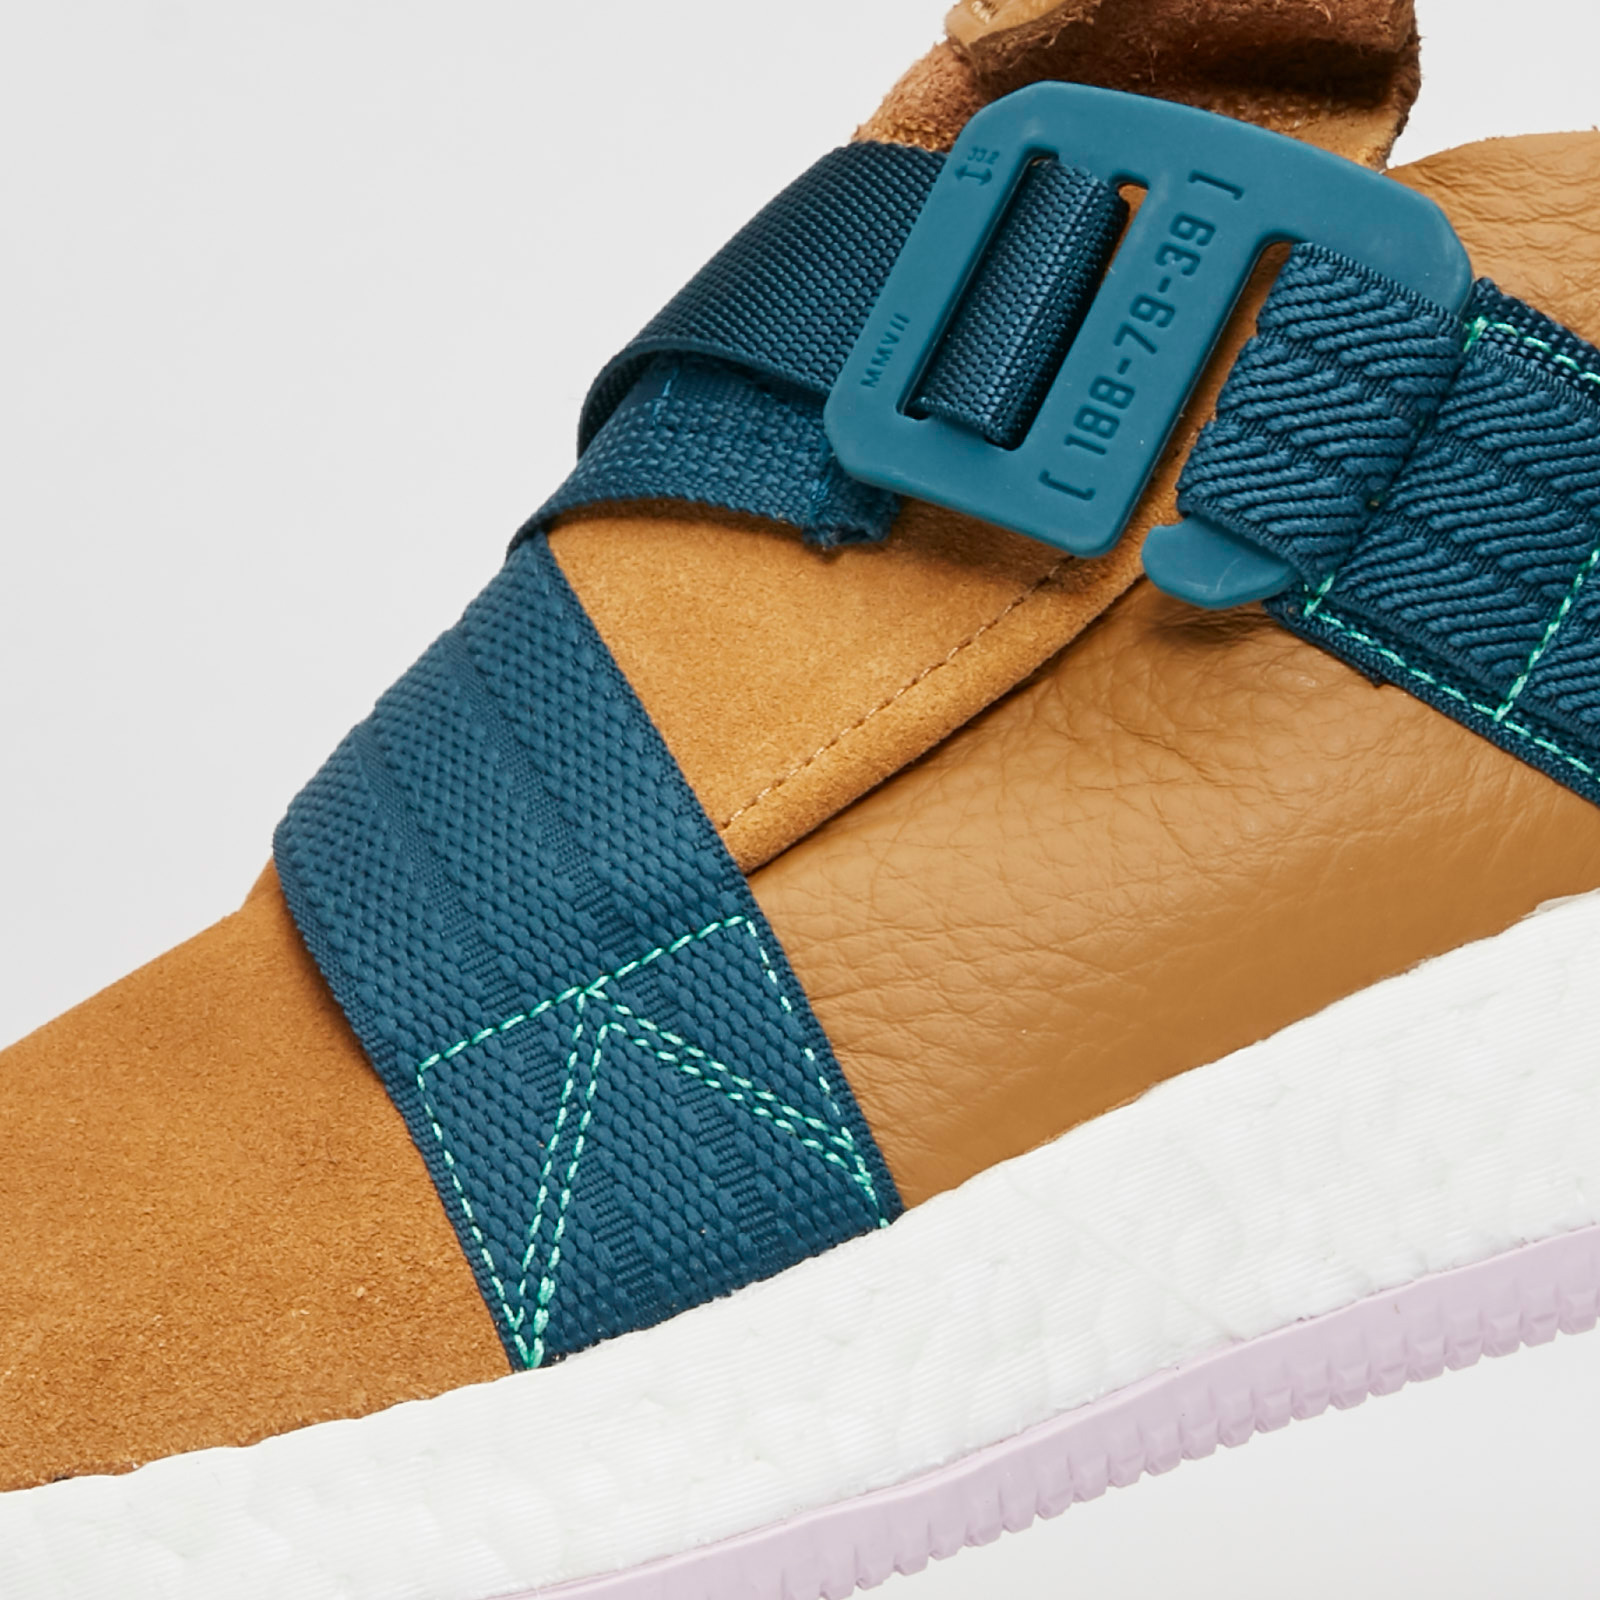 98c24cd2eb68 adidas Harden LS 2 Buckle - Aq0021 - Sneakersnstuff